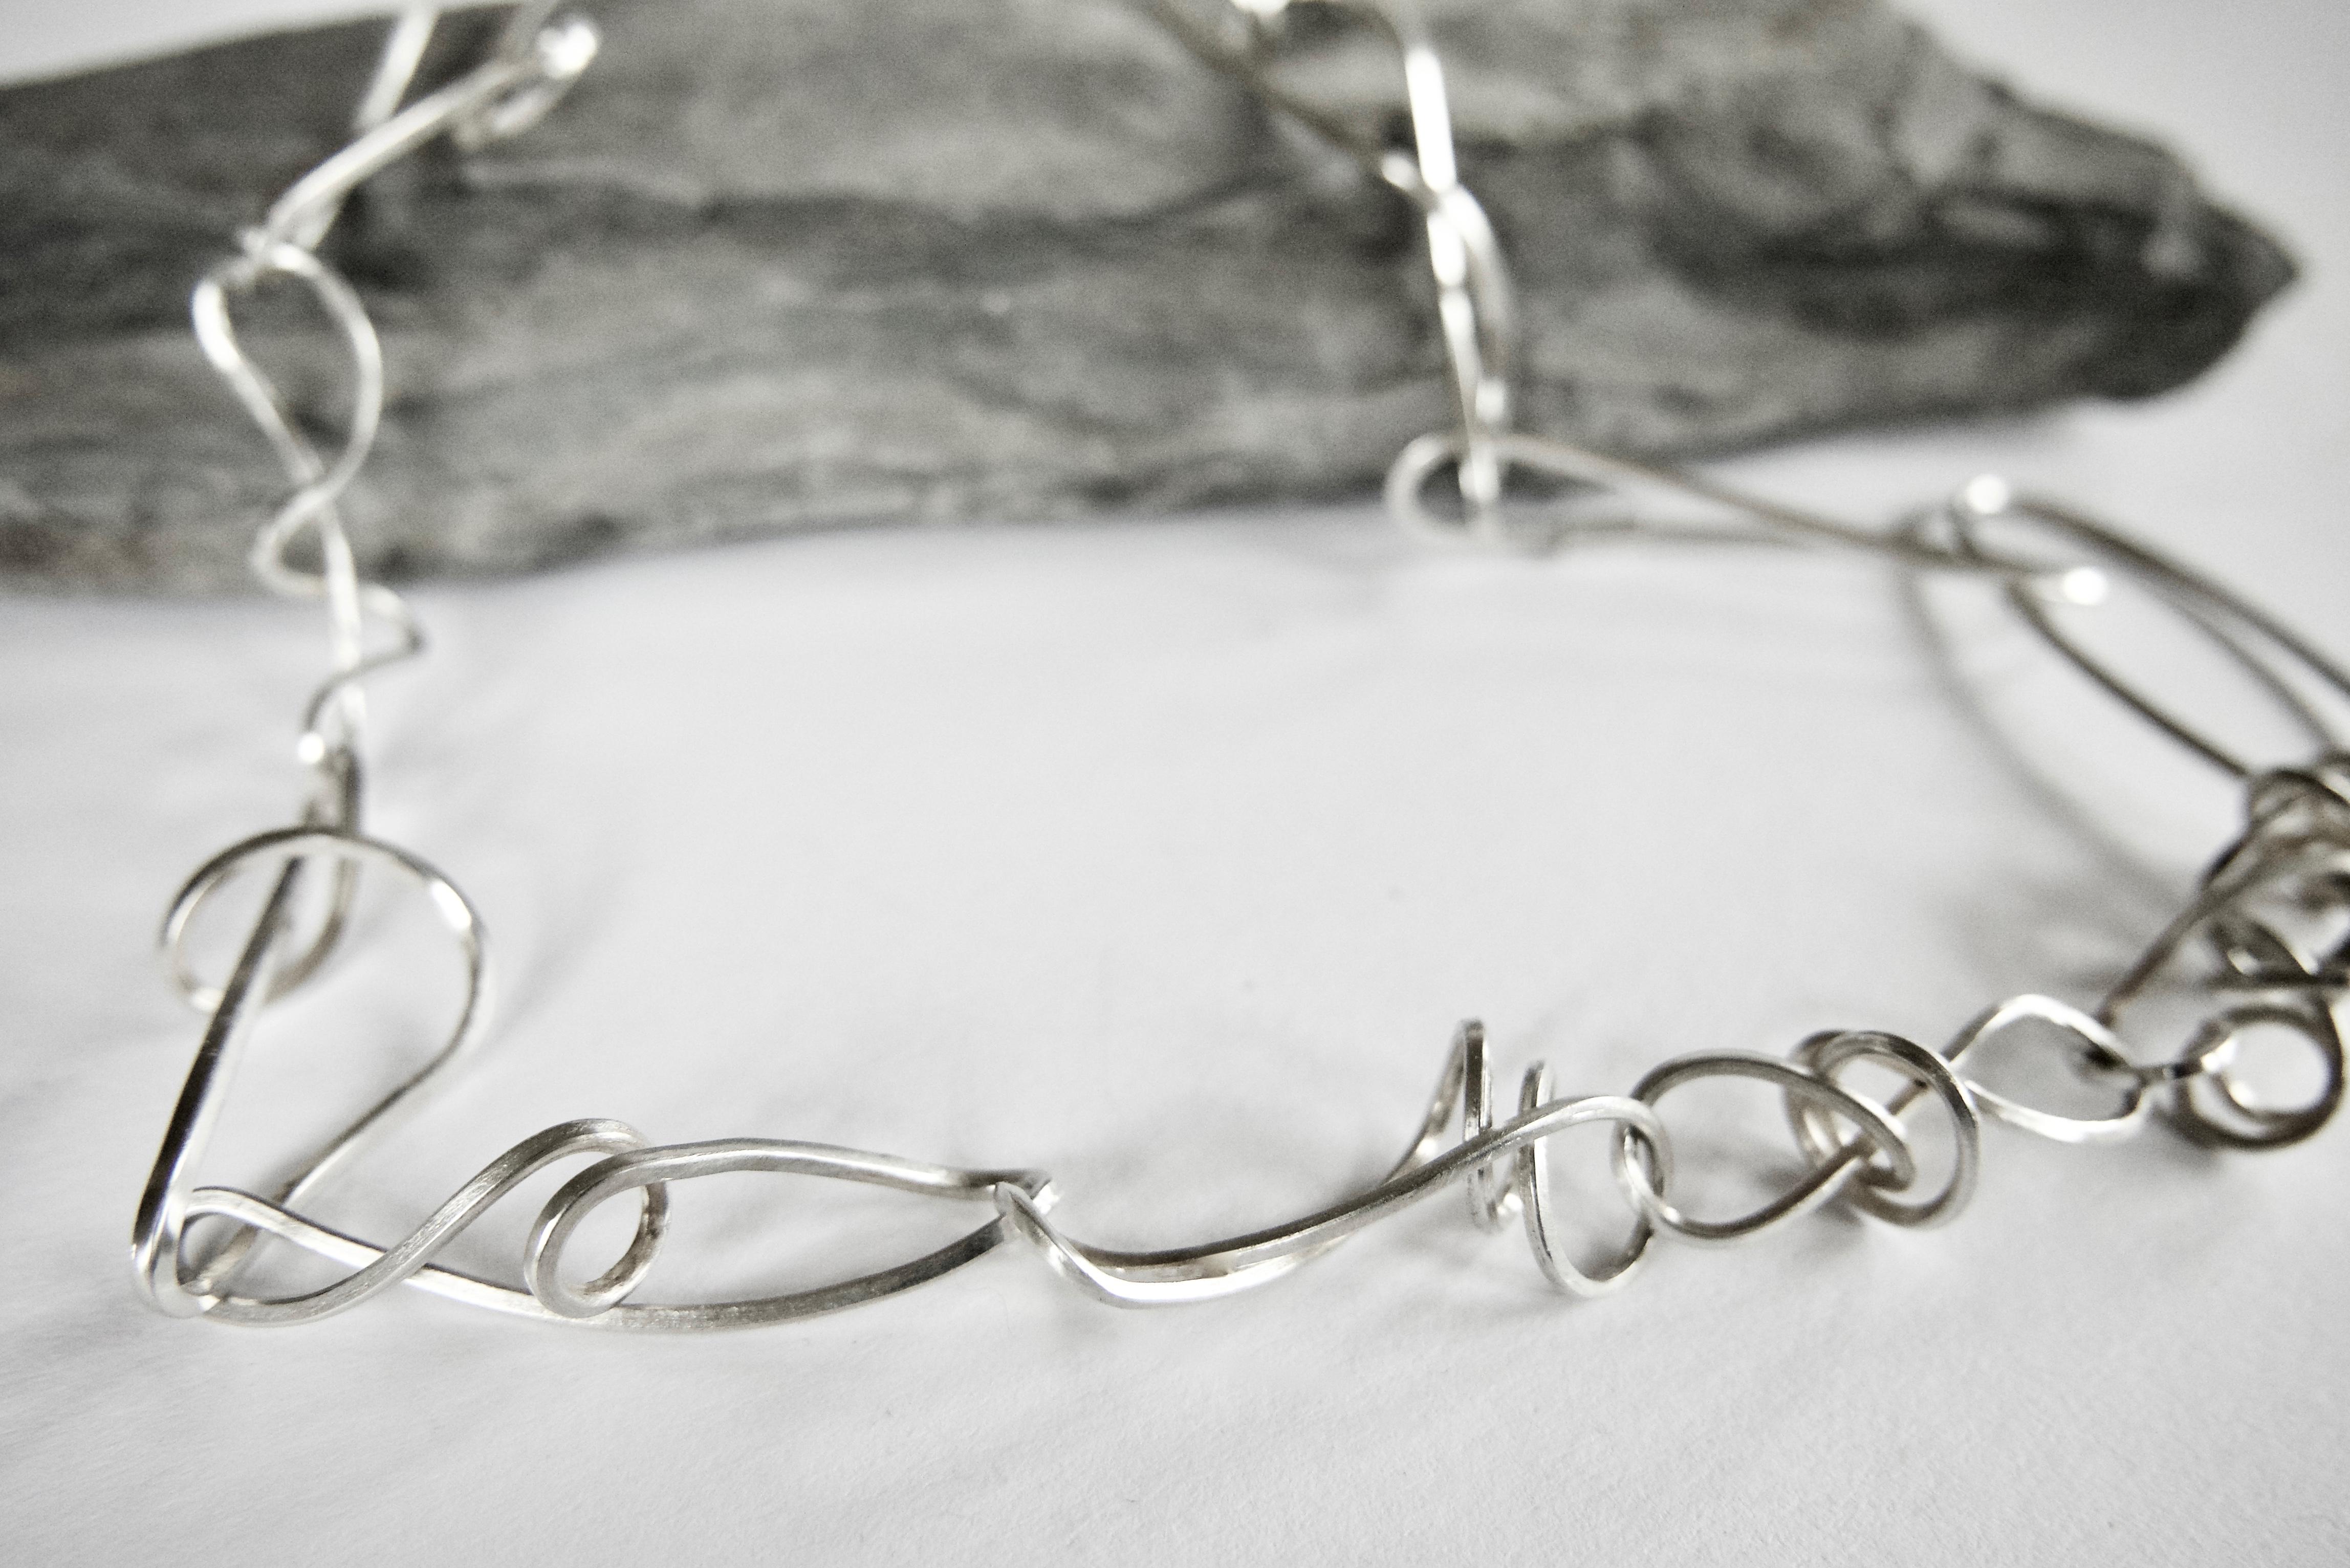 DK 35 Silberkette